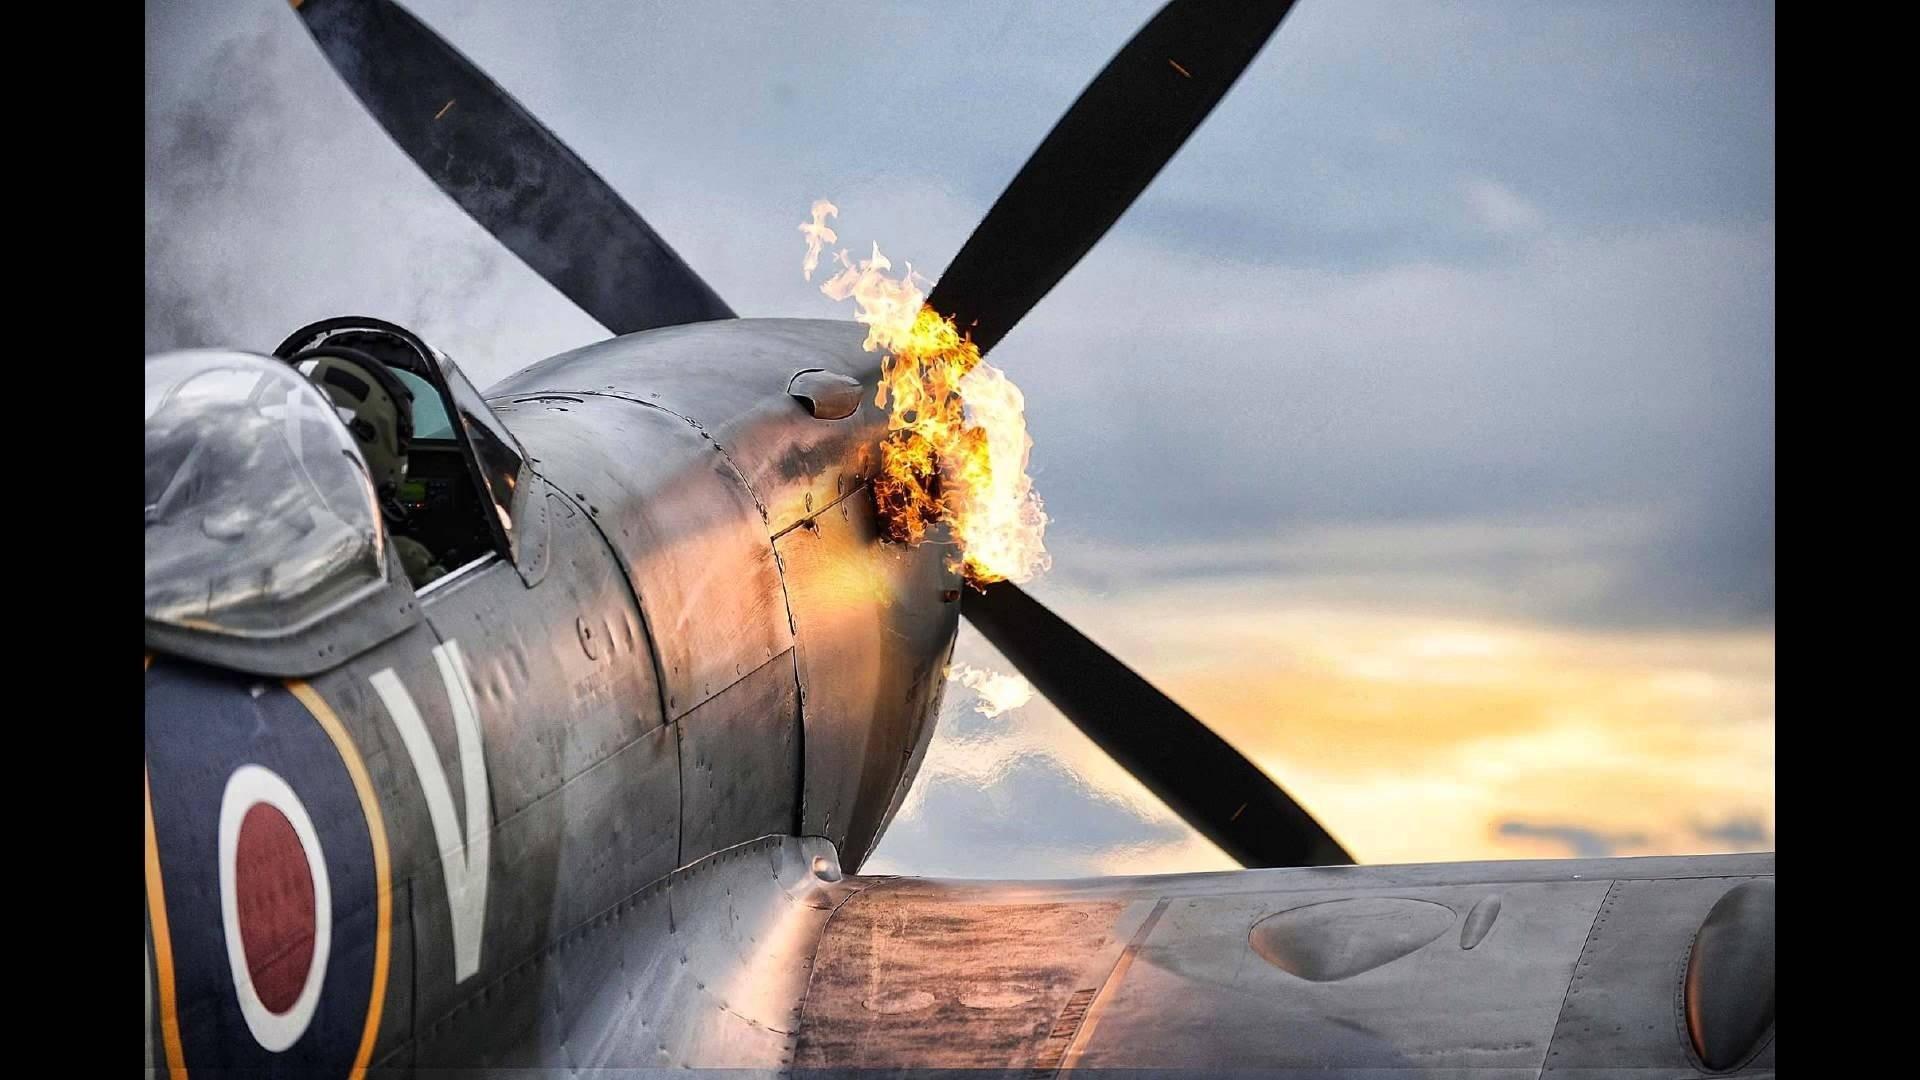 Spitfire Planes World War II Flame …